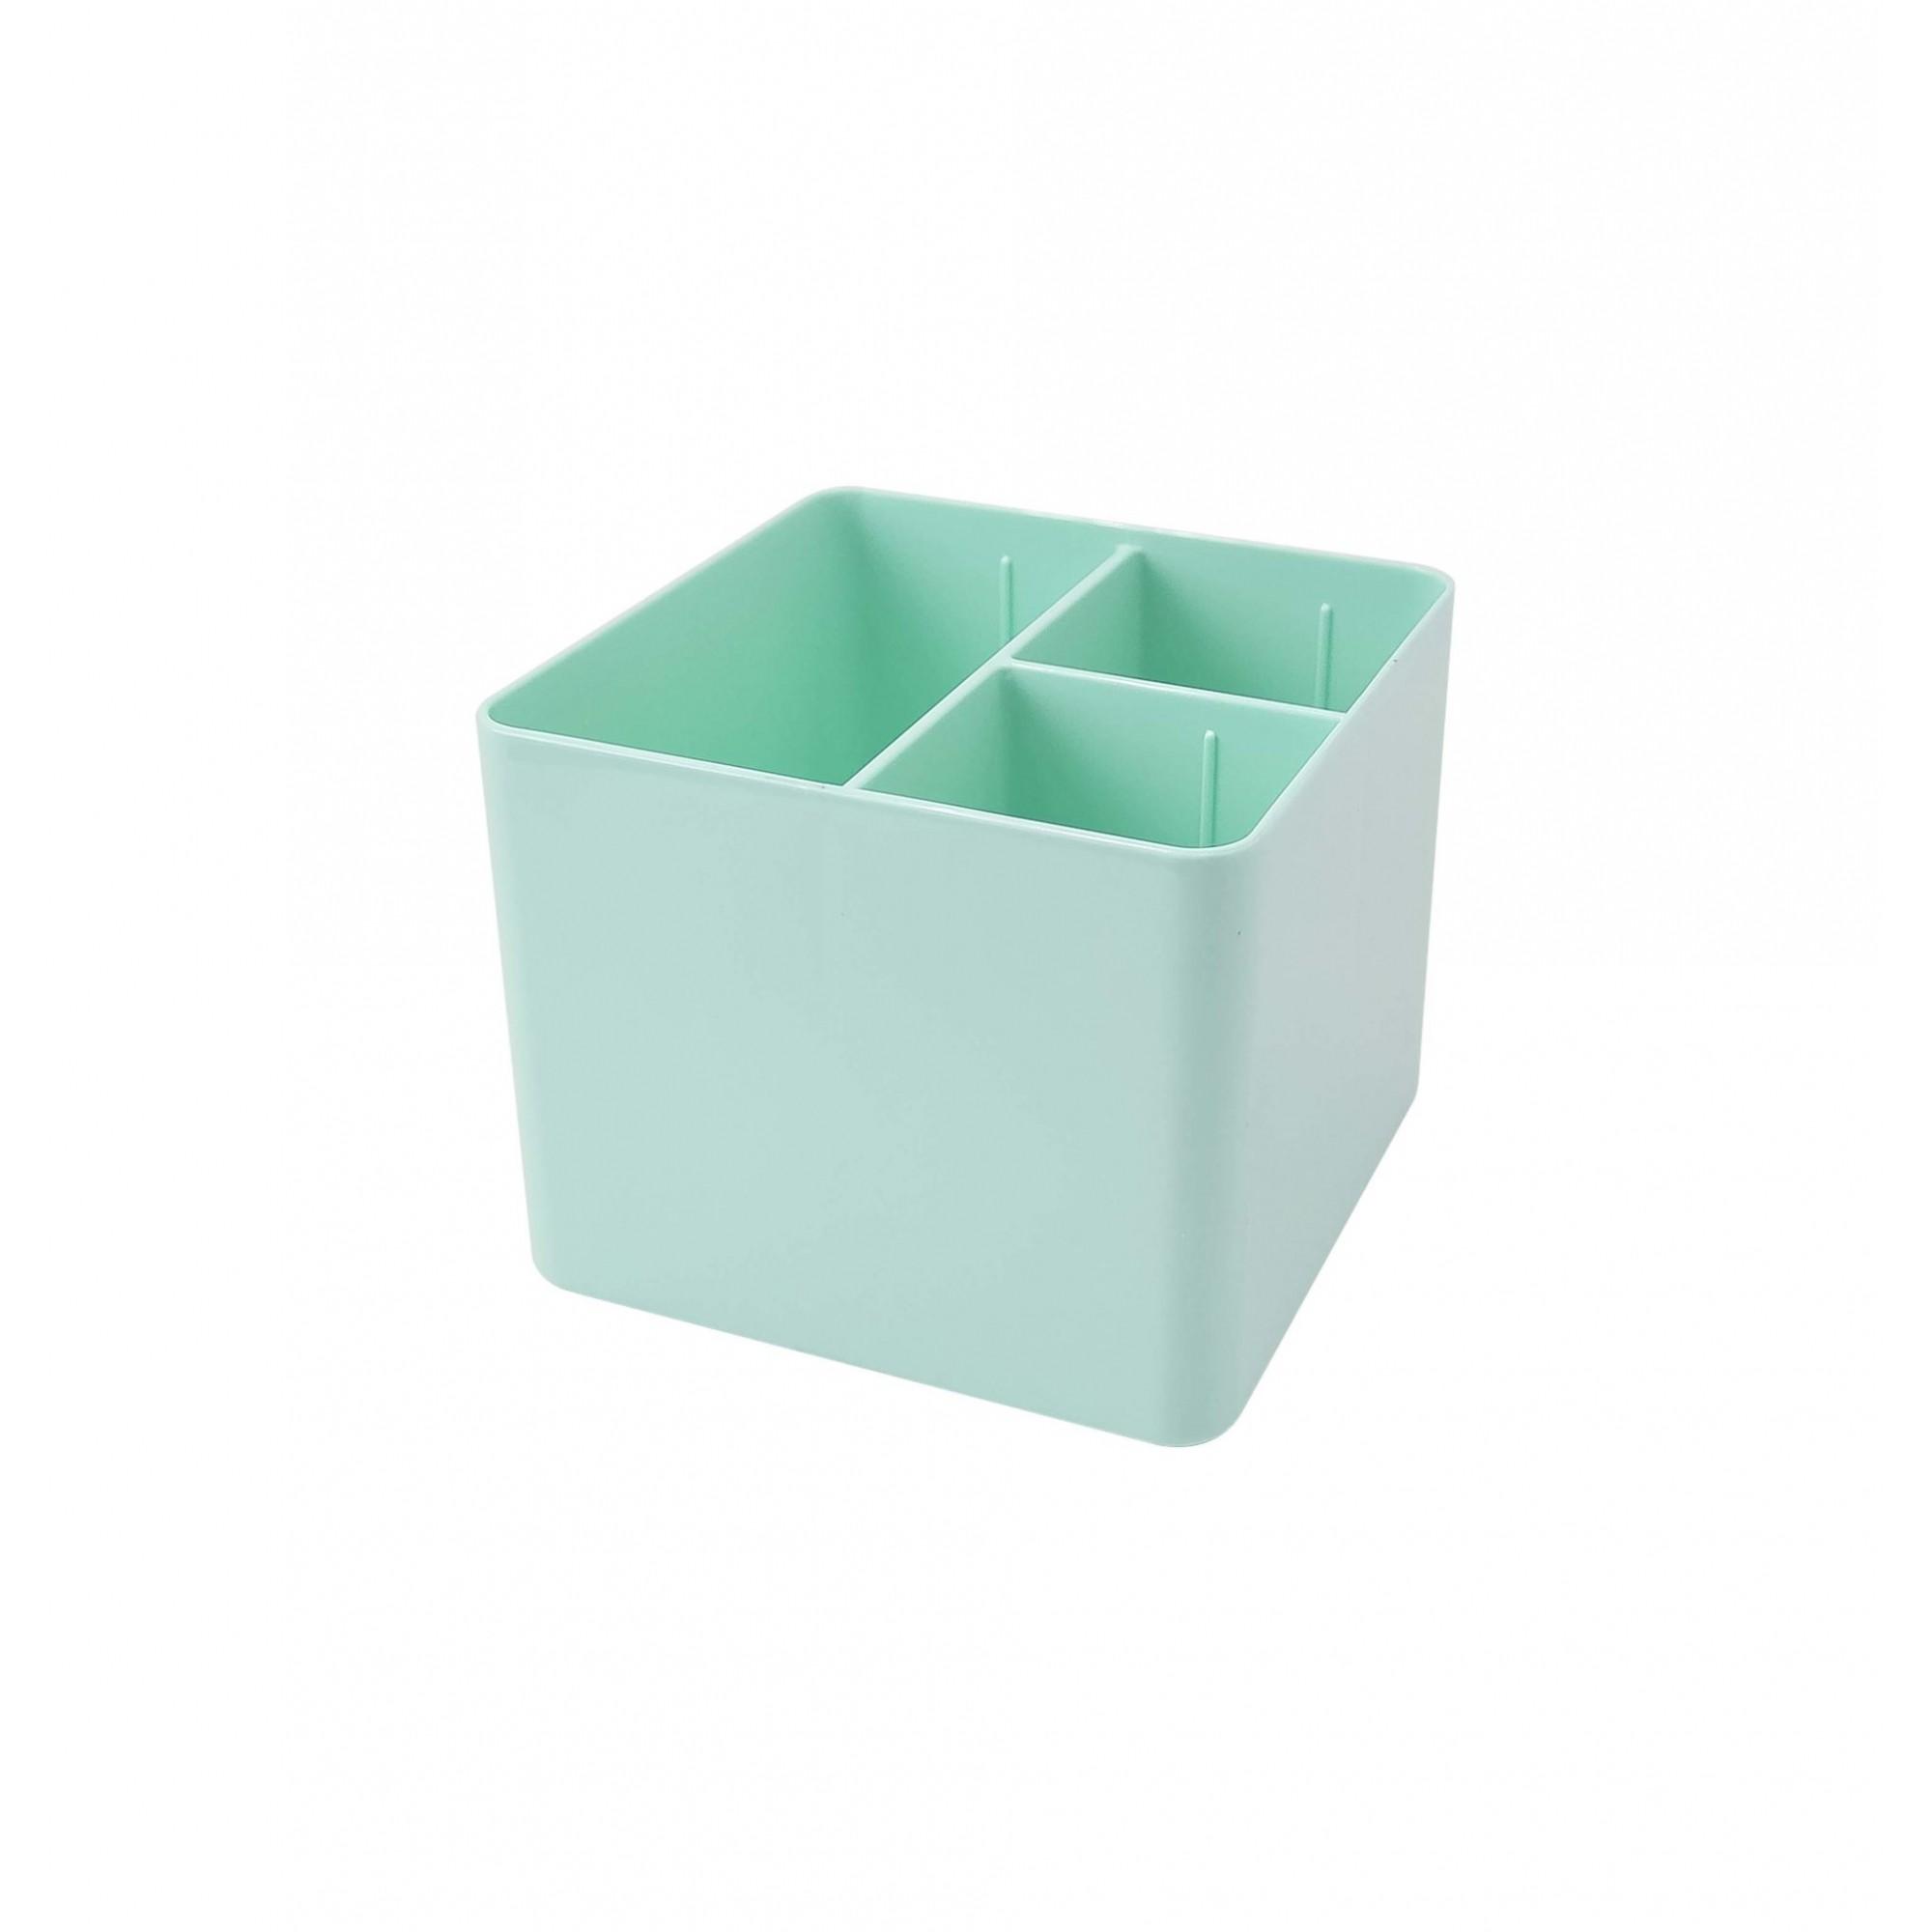 Porta Objetos 3 Divisorias Dello Verde Pastel 3020.Vp.0006 29654